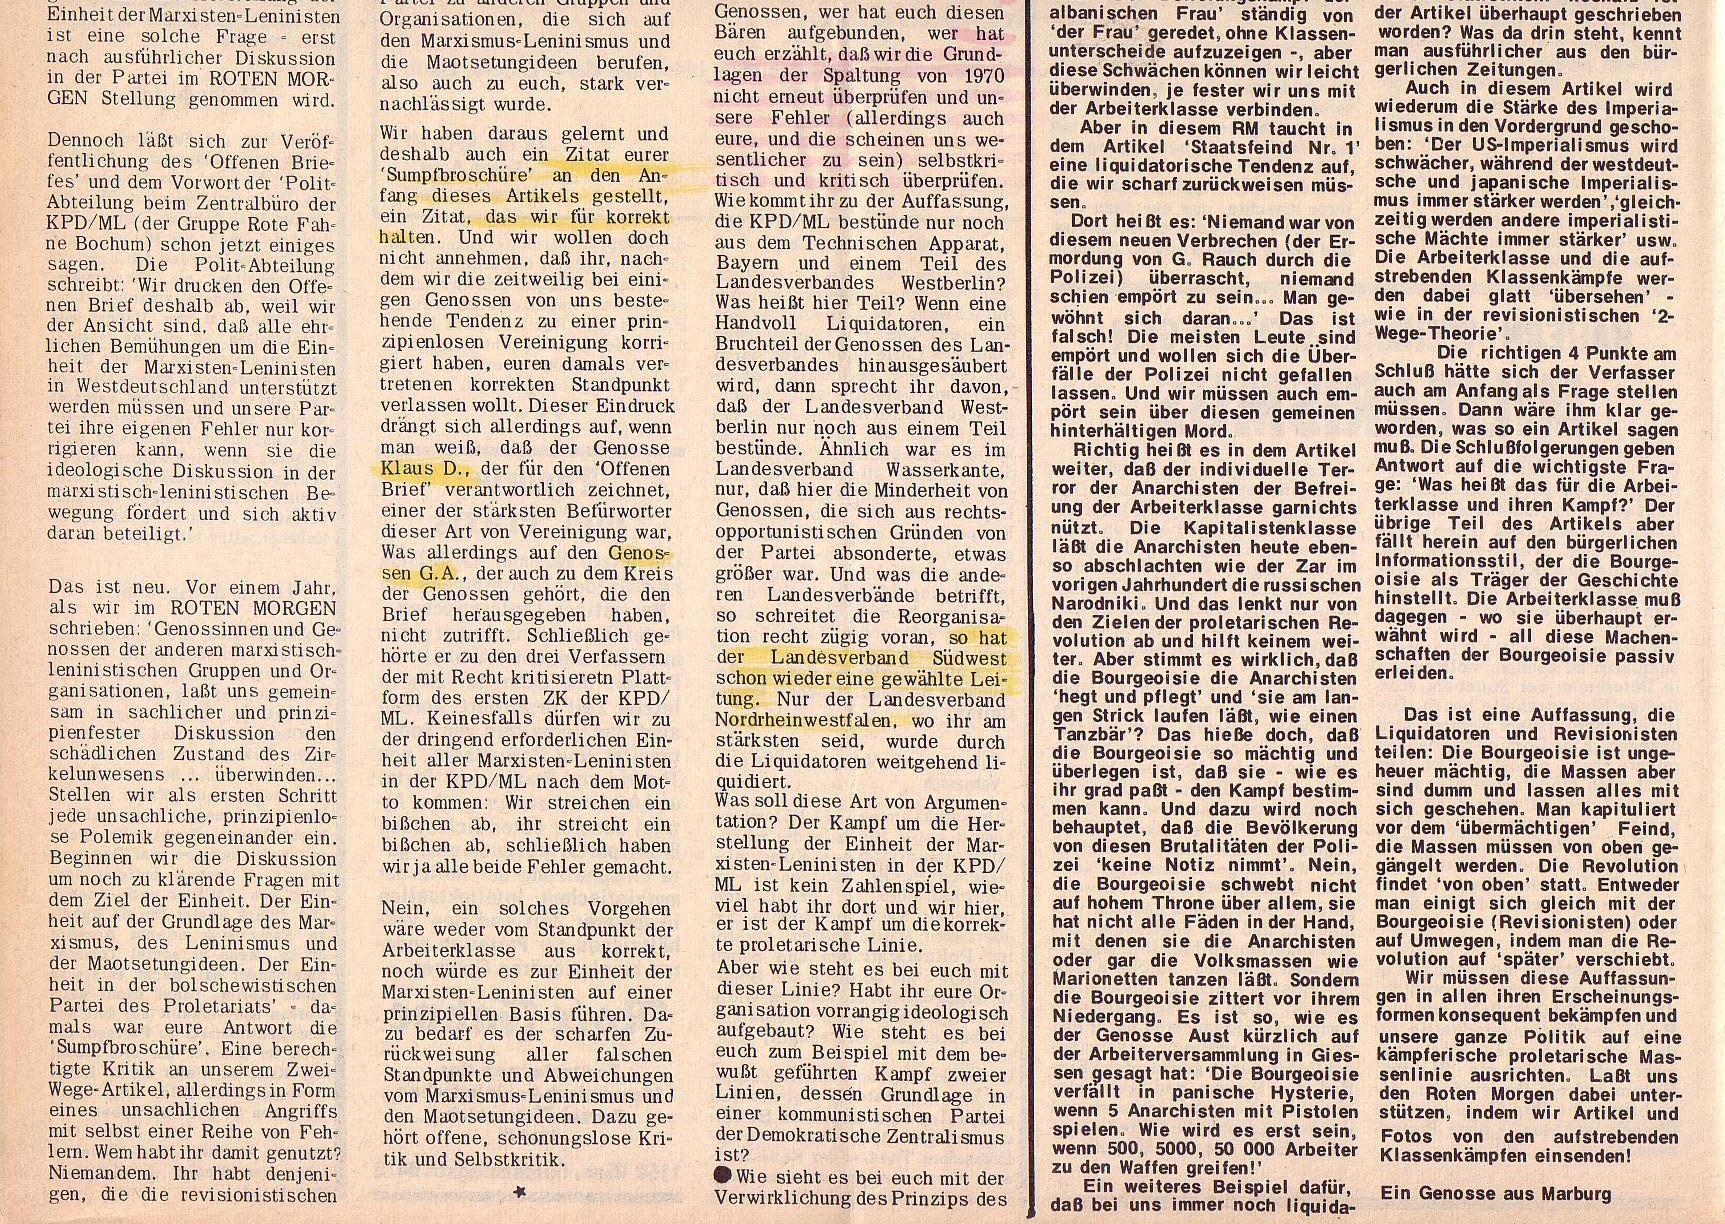 Roter Morgen, 6. Jg., 28. Februar 1972, Nr. 5, Seite 6b